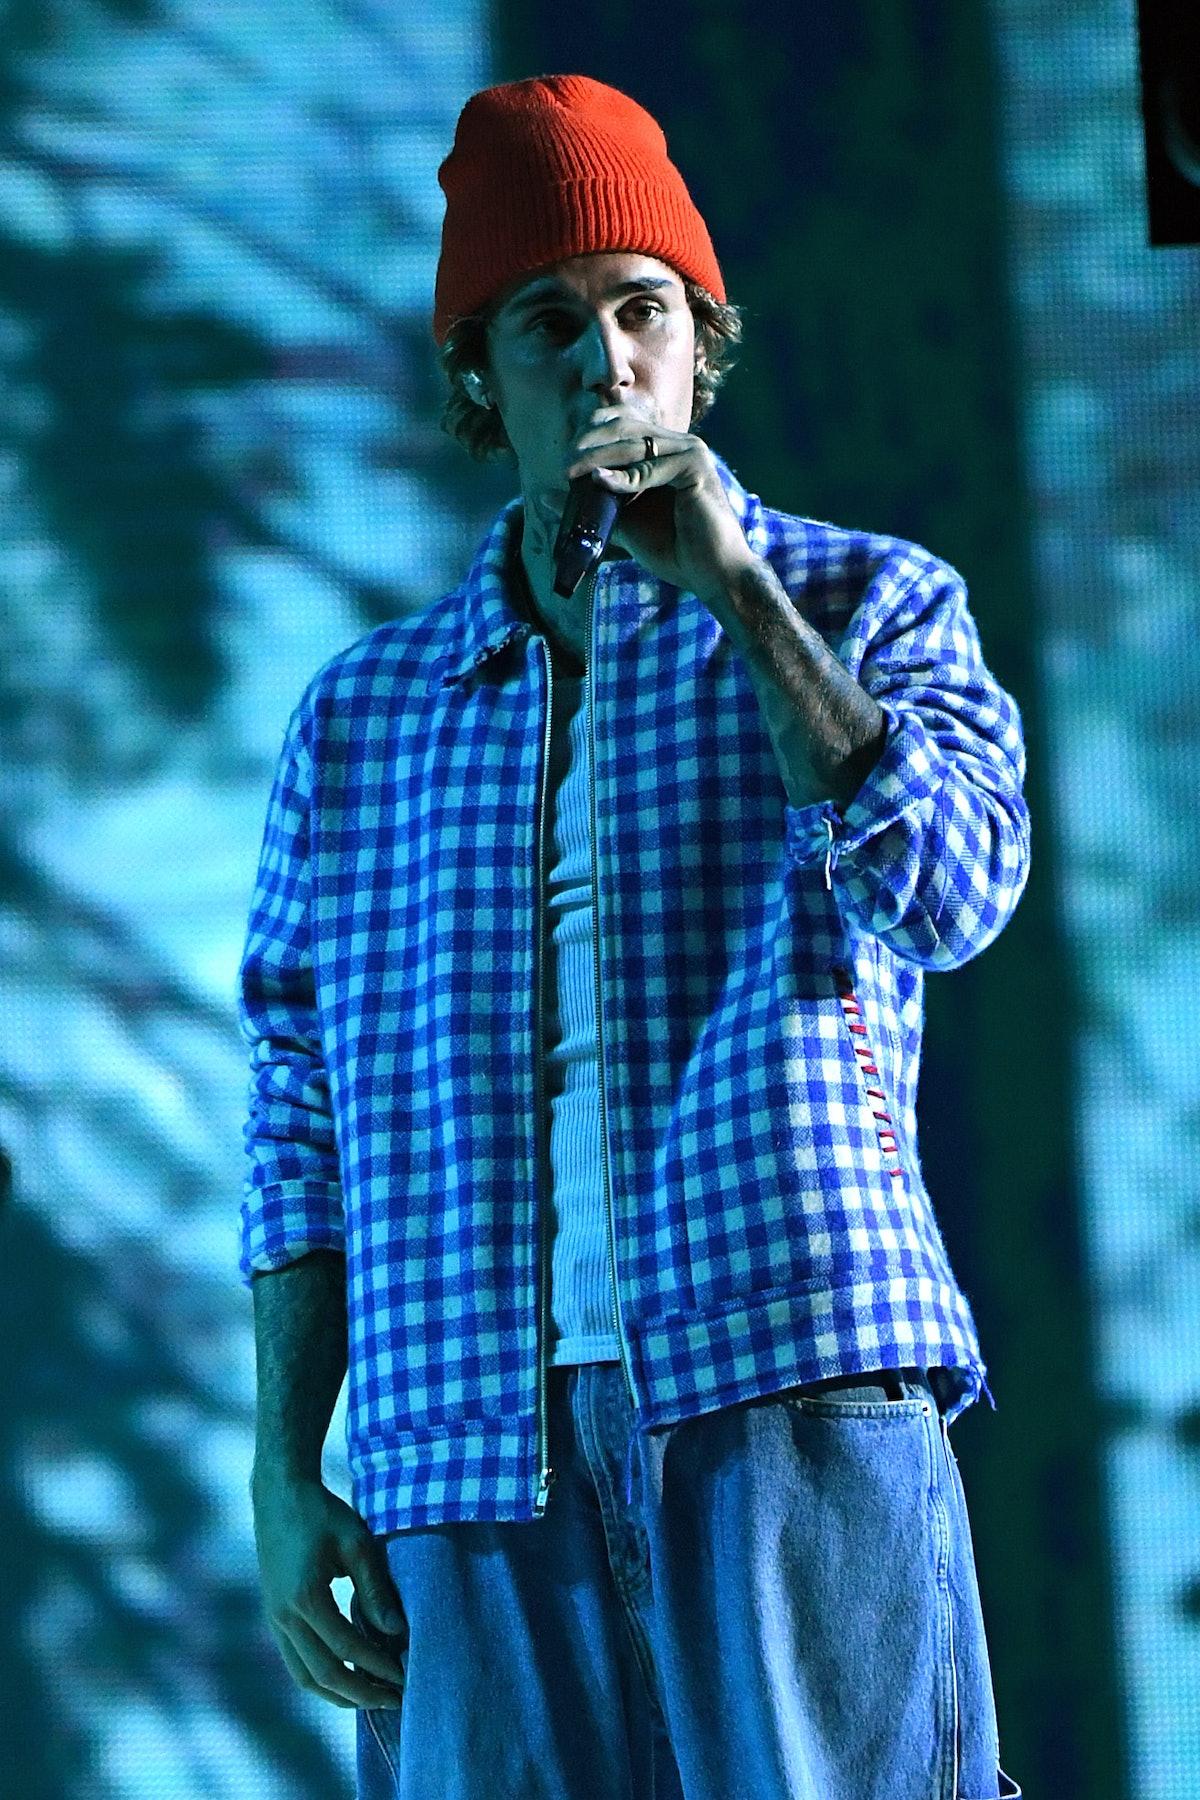 Justin Bieber performs live.